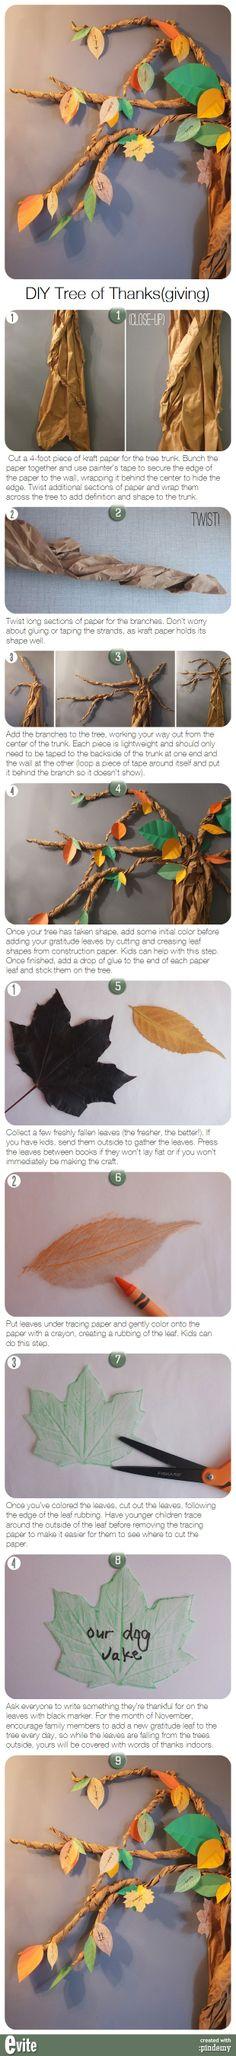 DIY Tree of Thanks(giving) via pindemy.com